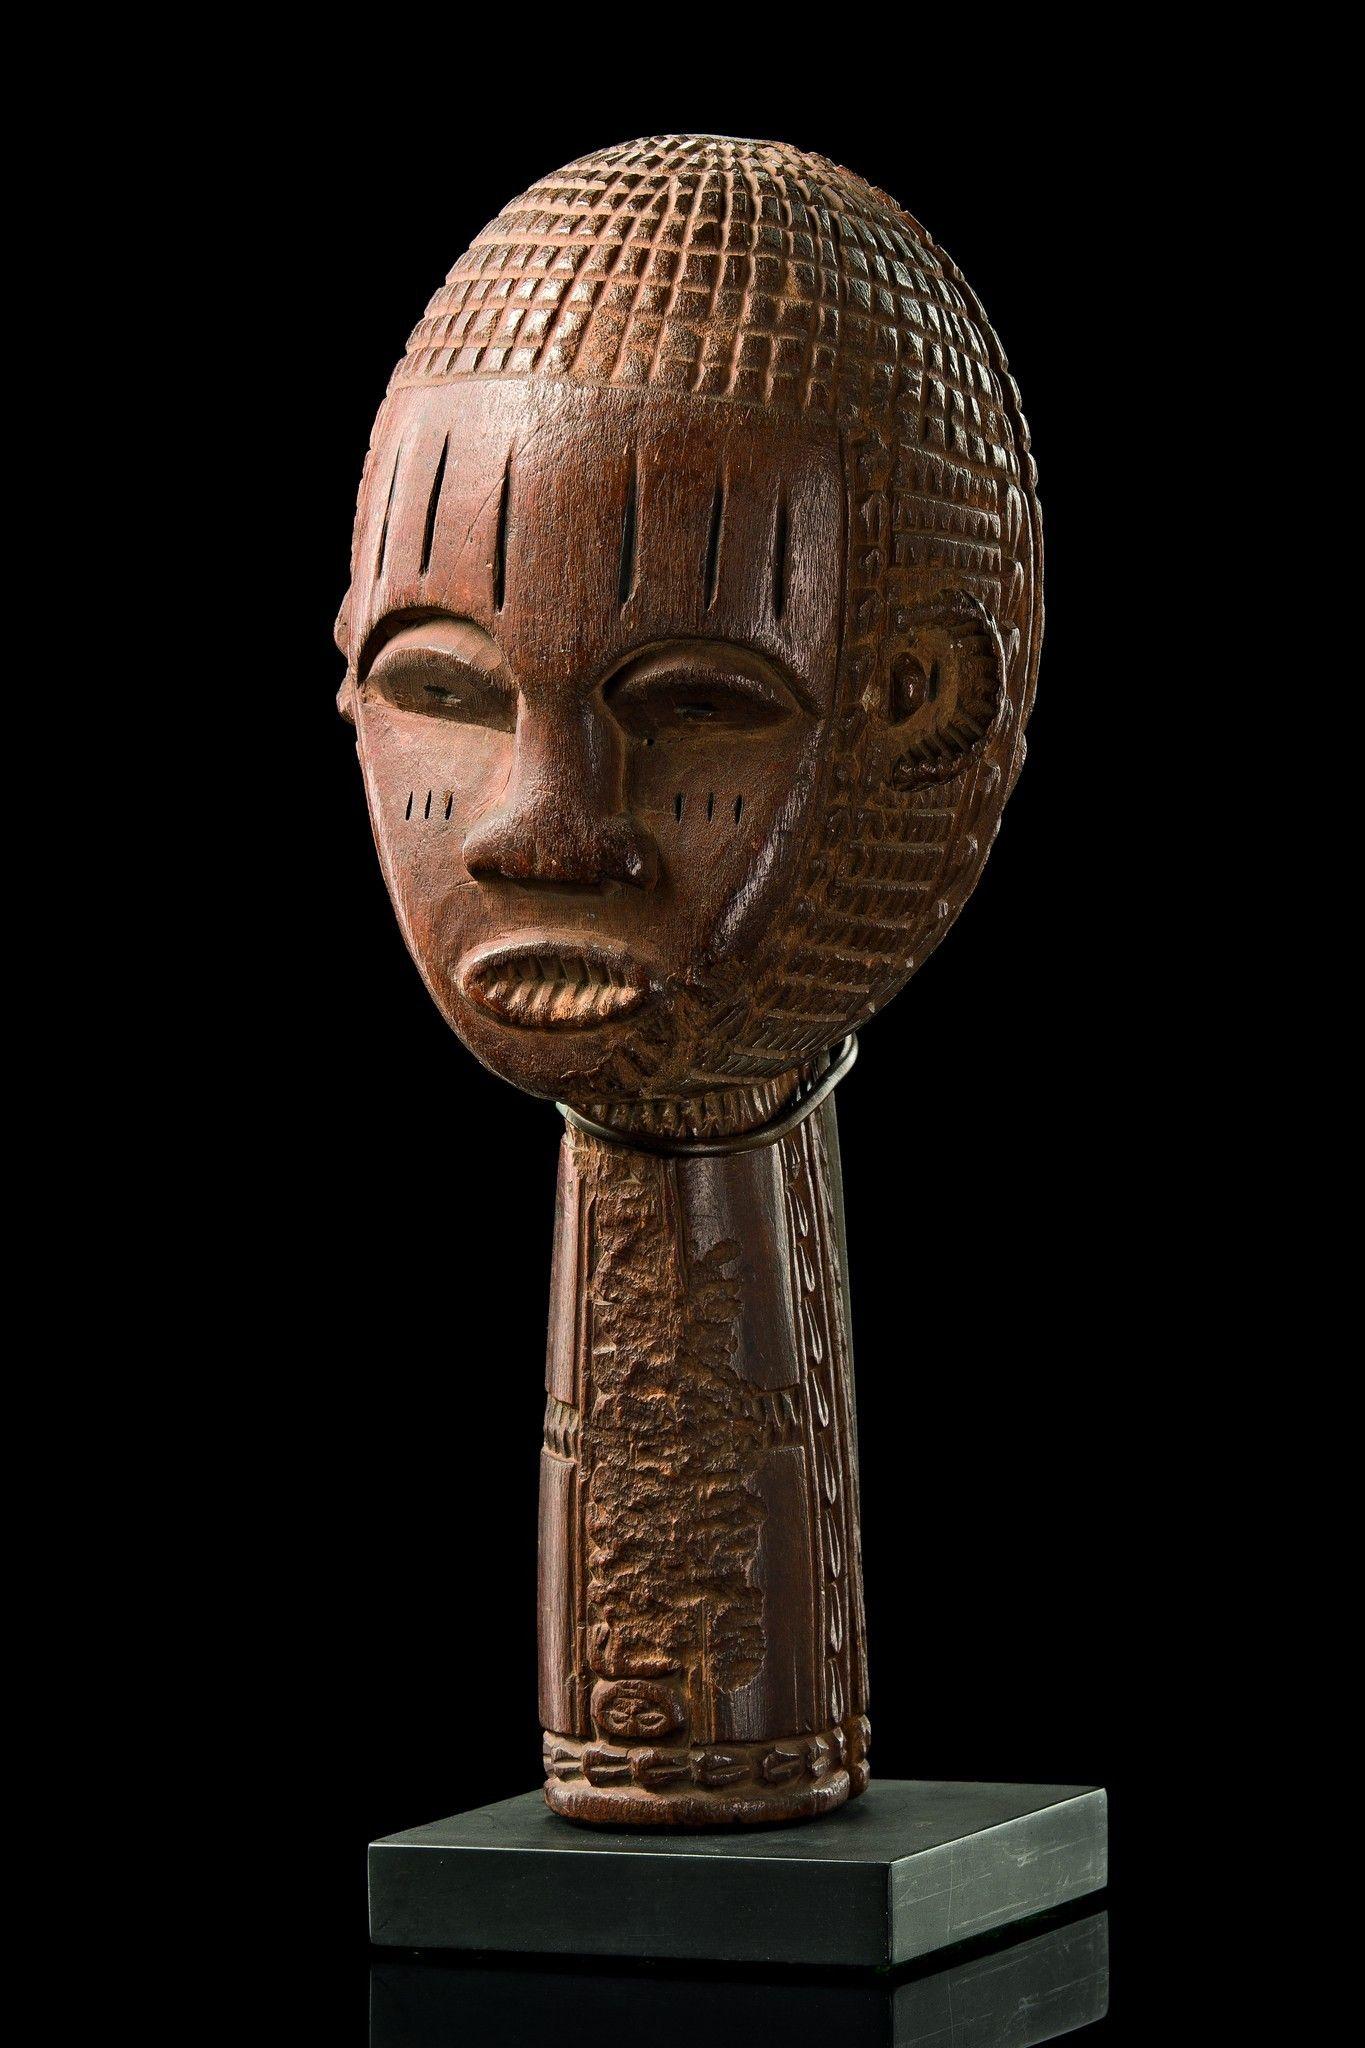 Nigeria Izzi Wood Brown Patina Remains Of Black Paint